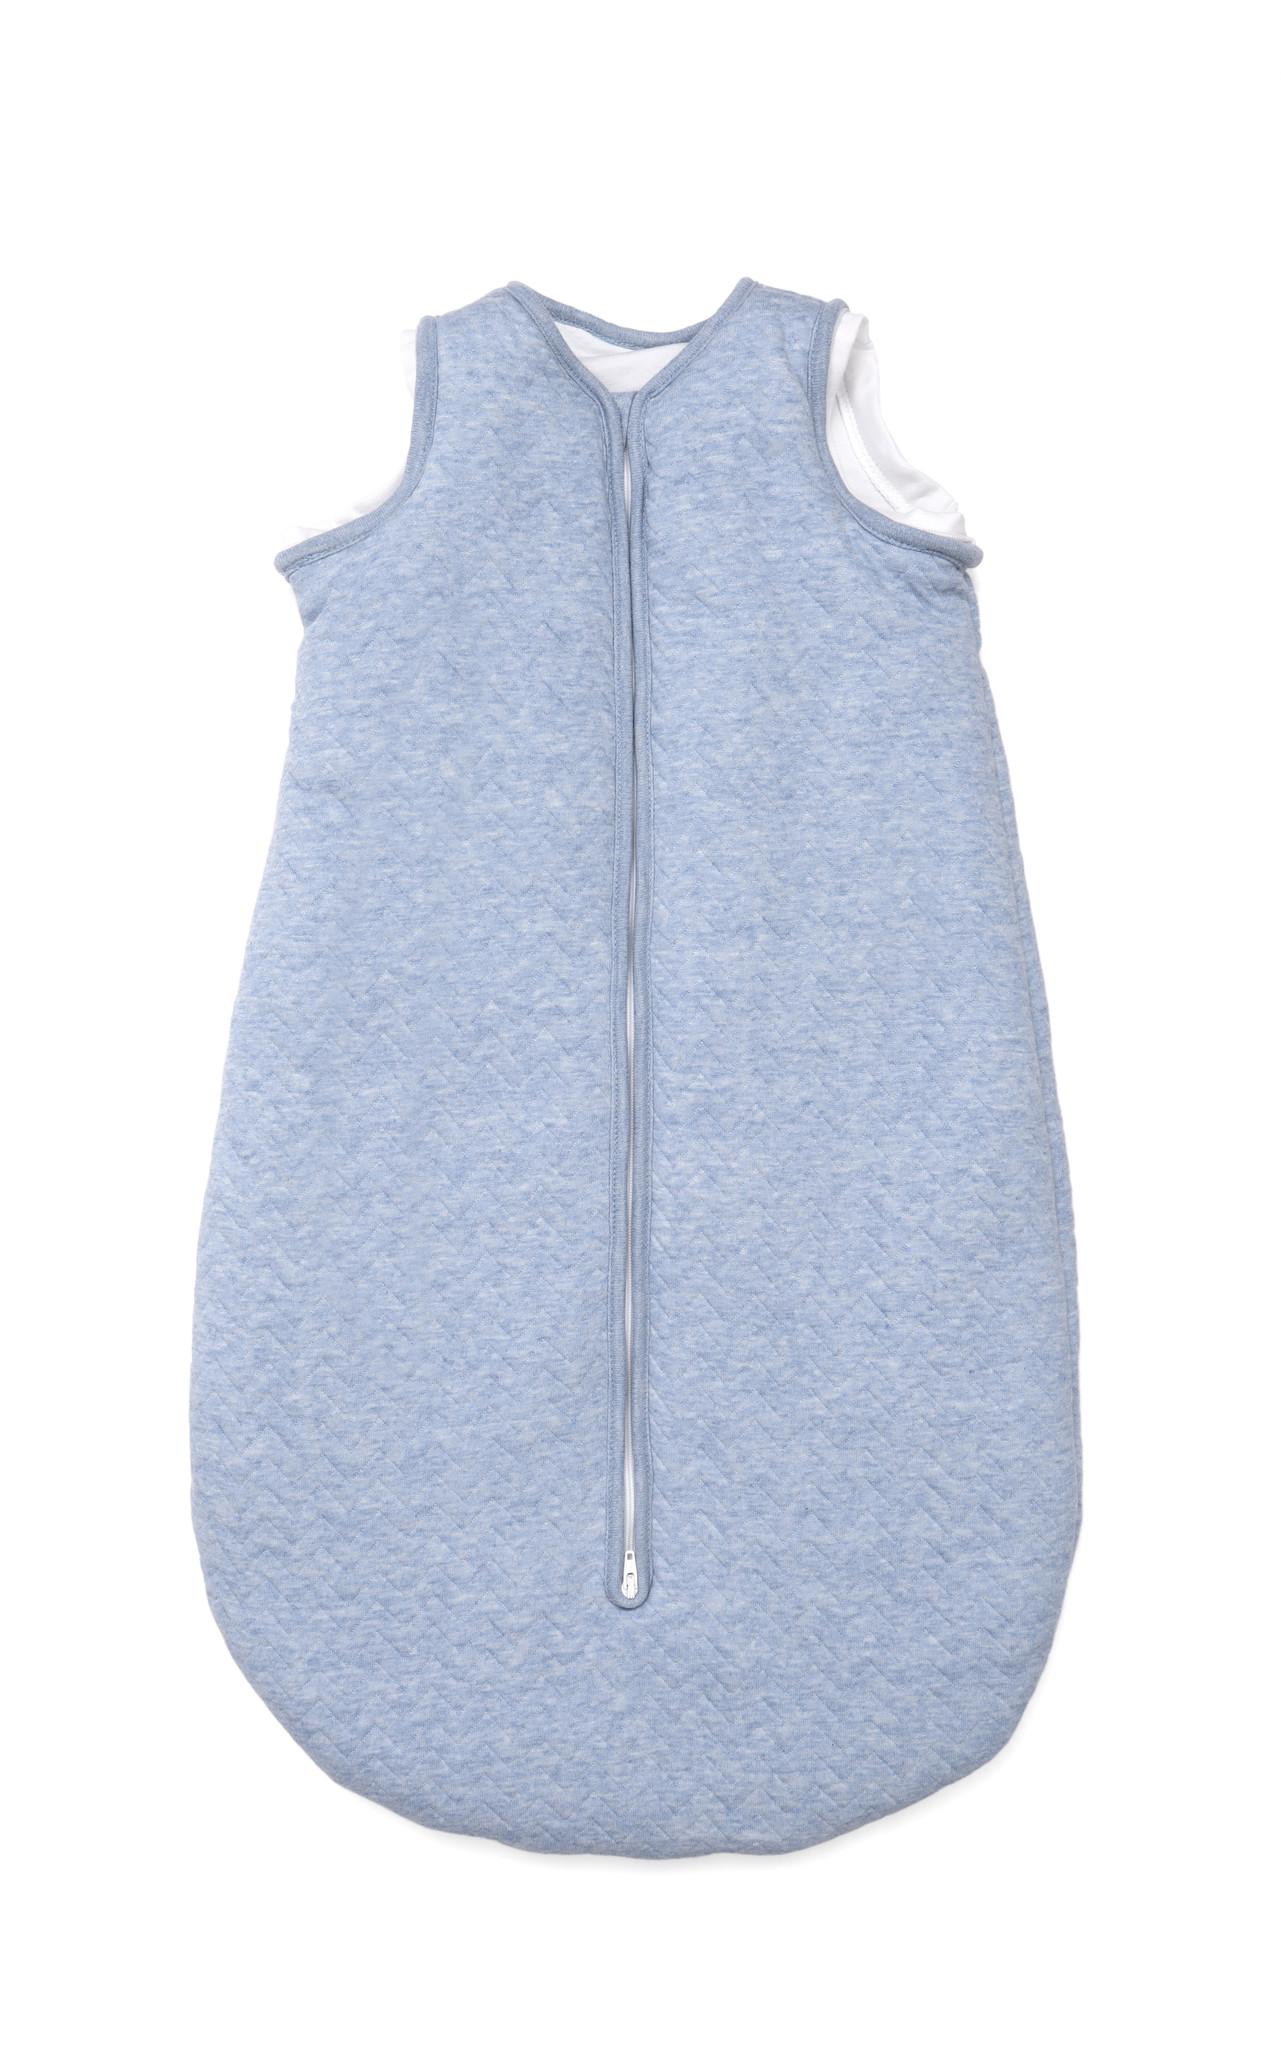 Jersey slaapzak 90cm met afritsbare mouwen Chevron Denim Blue-3